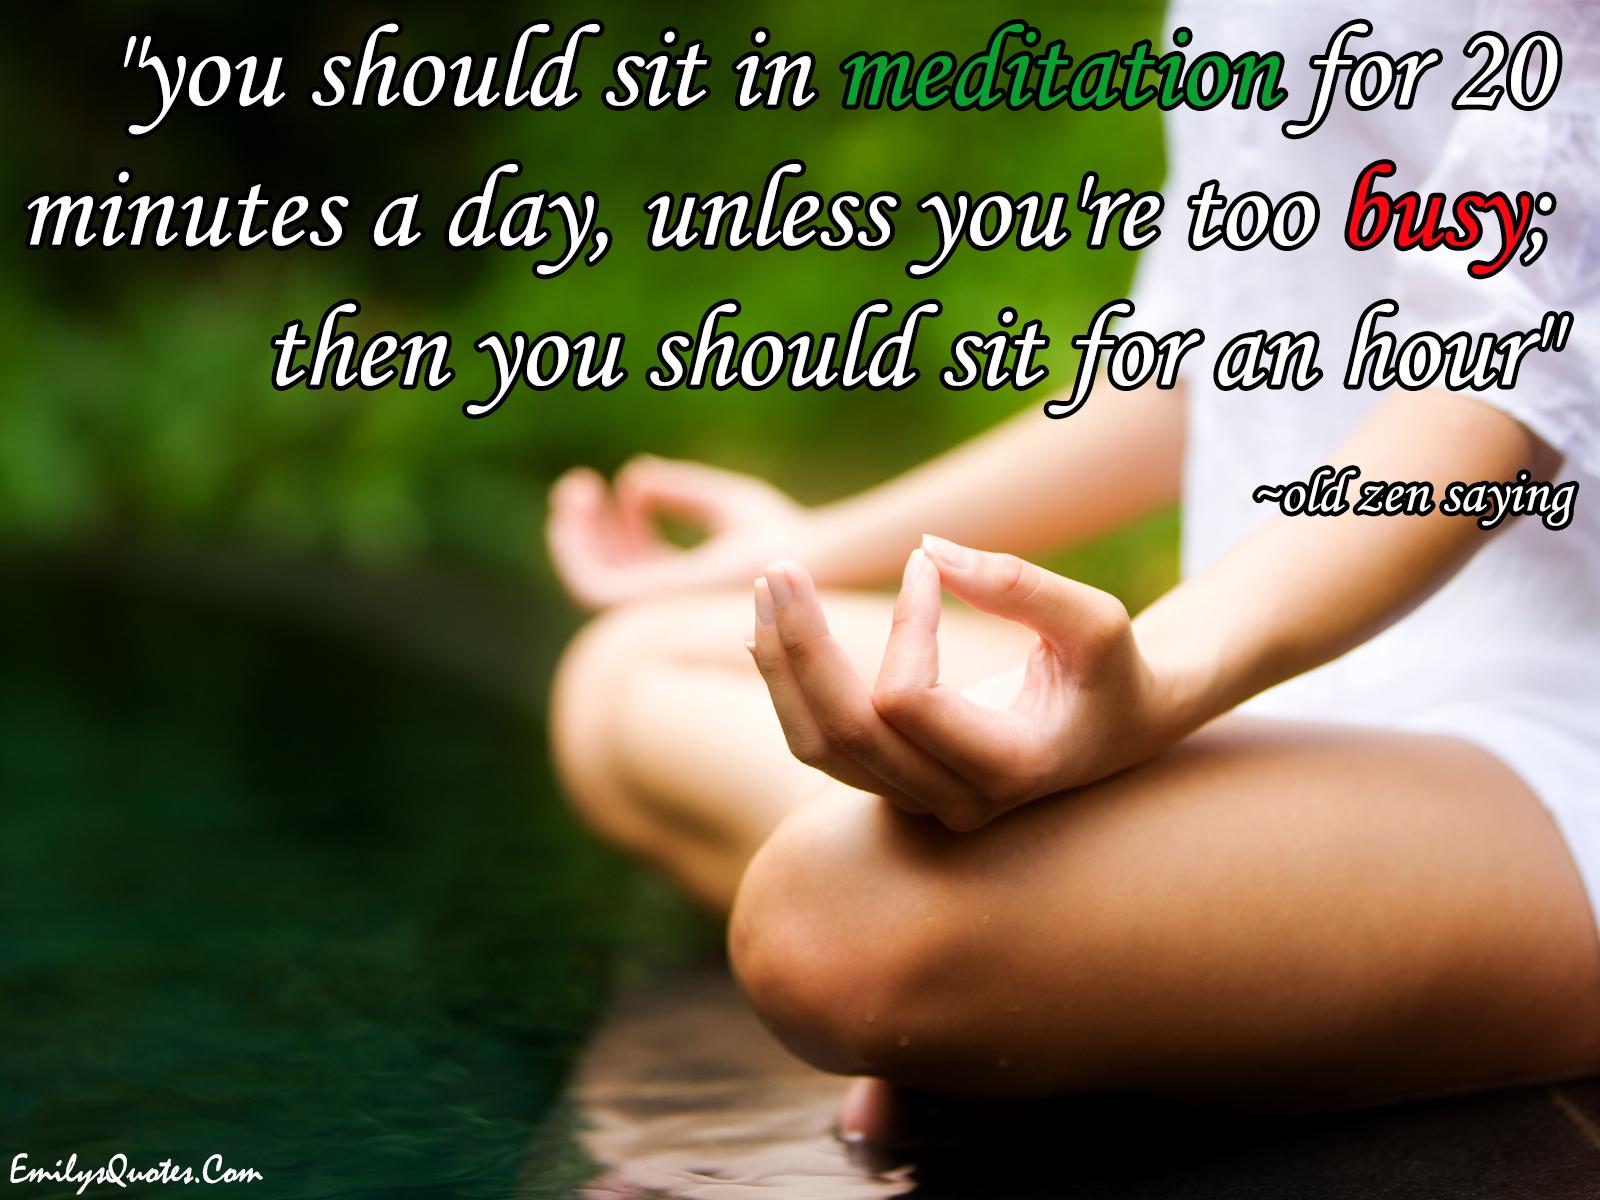 EmilysQuotes.Com - meditation, spirit, inner peace, old zen saying, wisdom